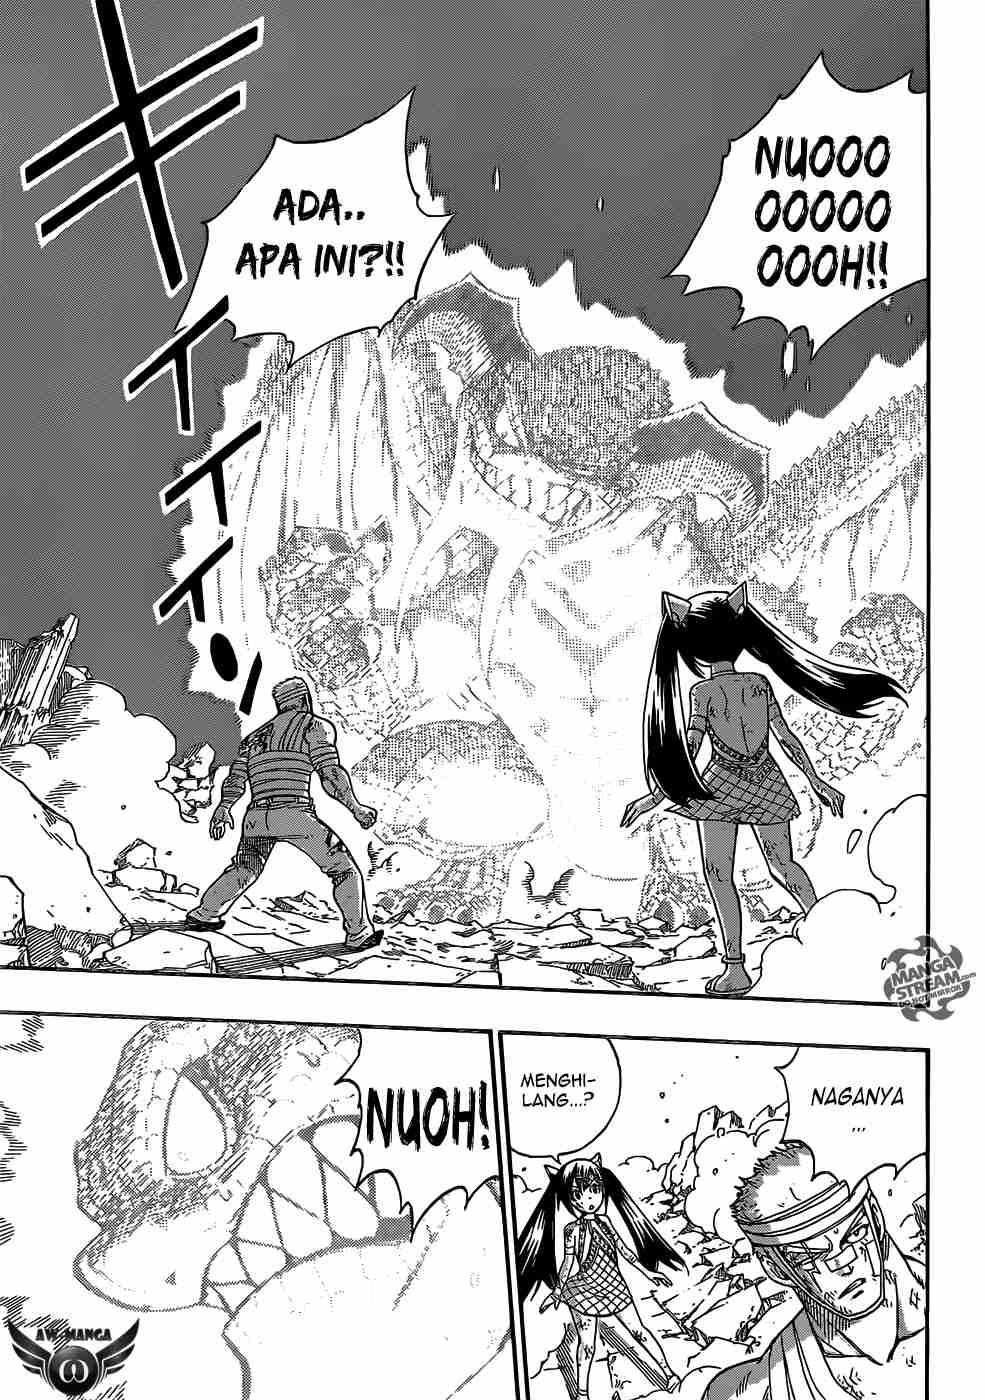 Komik fairy tail 337 - rencana emas 338 Indonesia fairy tail 337 - rencana emas Terbaru 6|Baca Manga Komik Indonesia|Mangacan